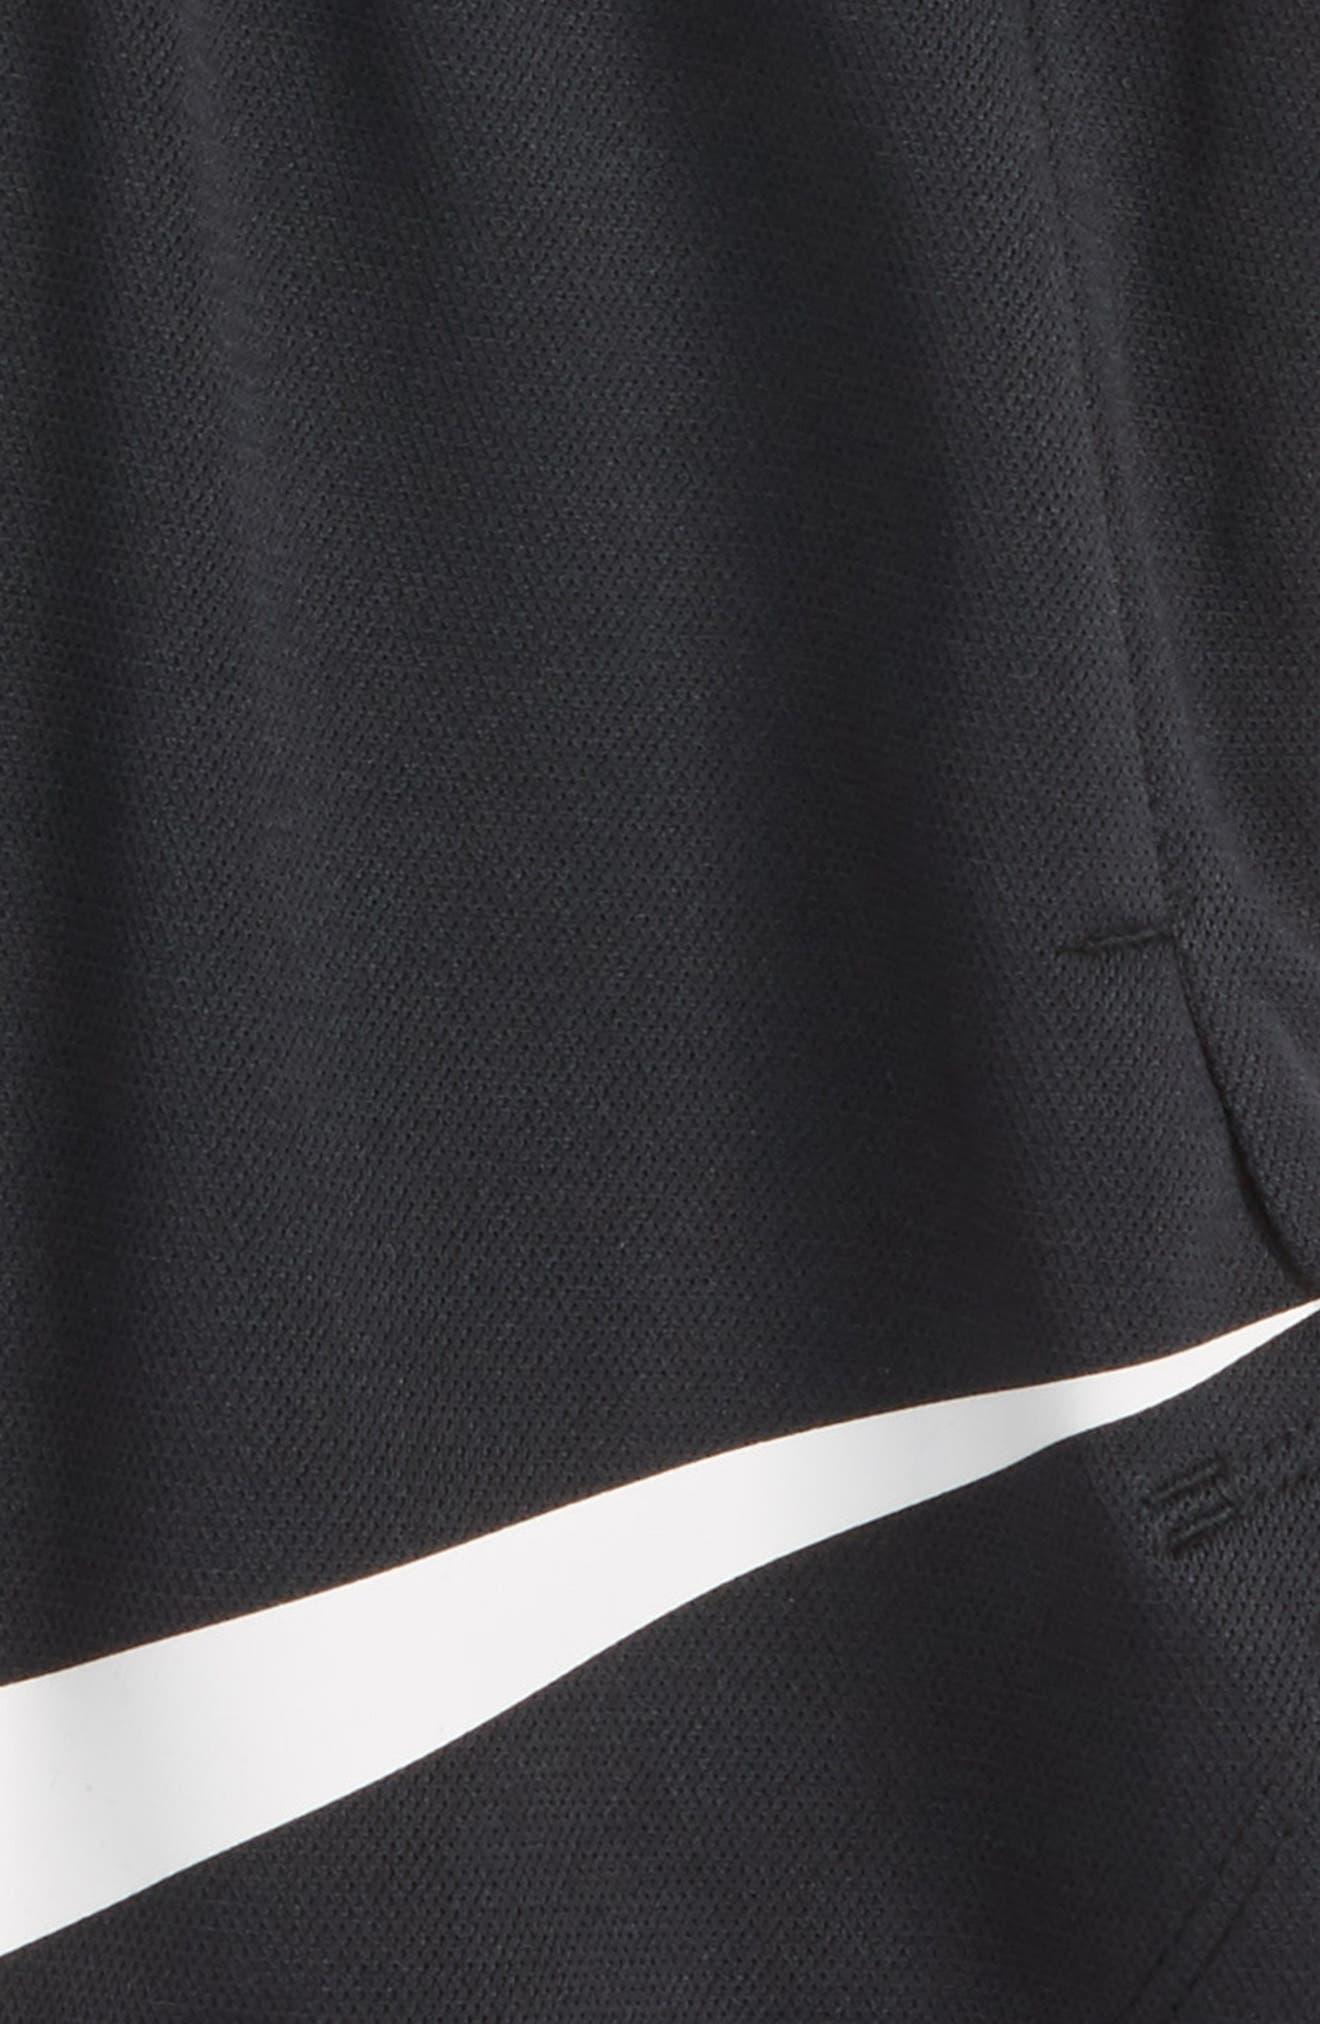 Vent GFX Dri-FIT Shorts,                             Main thumbnail 1, color,                             001